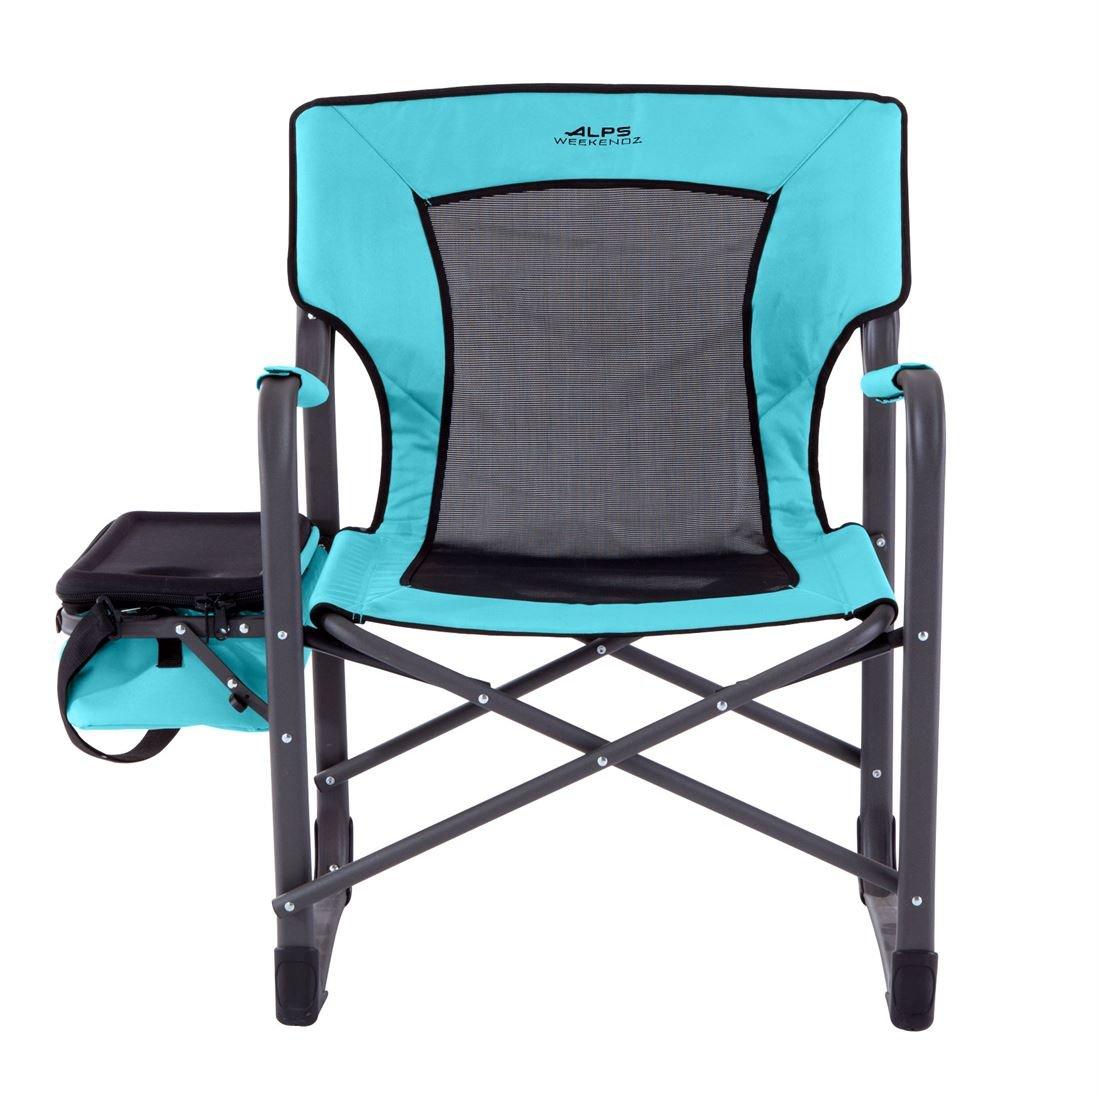 Brylanehome Alps Cooler Camp Chair ブルー 19447881321mk0~0 B019WMEHP0 ターコイズ ターコイズ